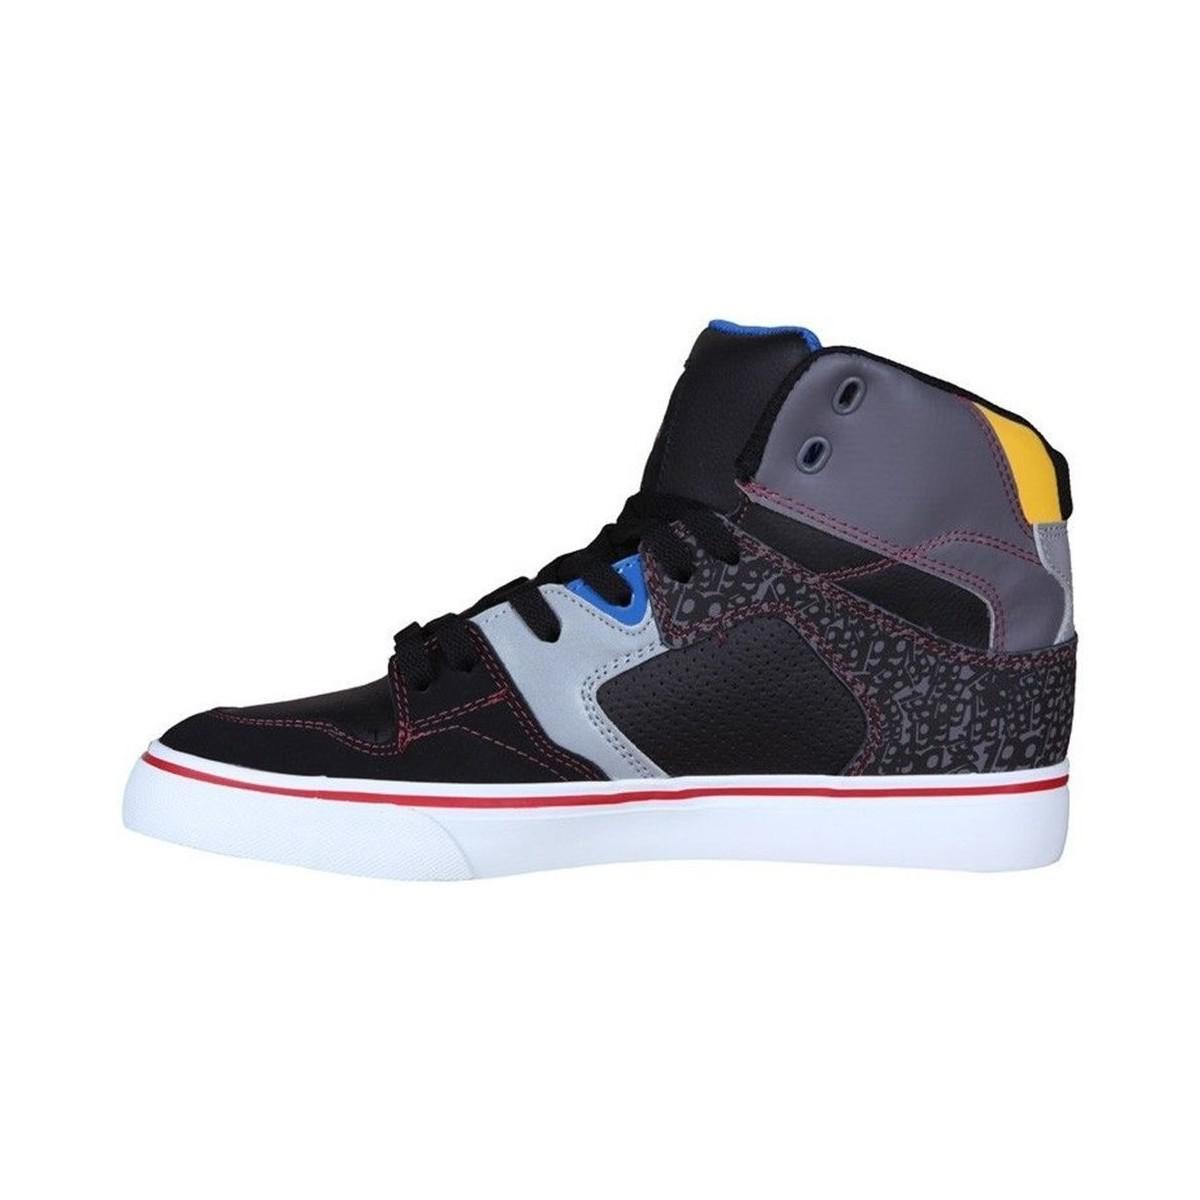 DC Shoes Pro Spec Vulc 30 Tp Ktr Men's Shoes (high-top Trainers) In Multicolour in Blue for Men